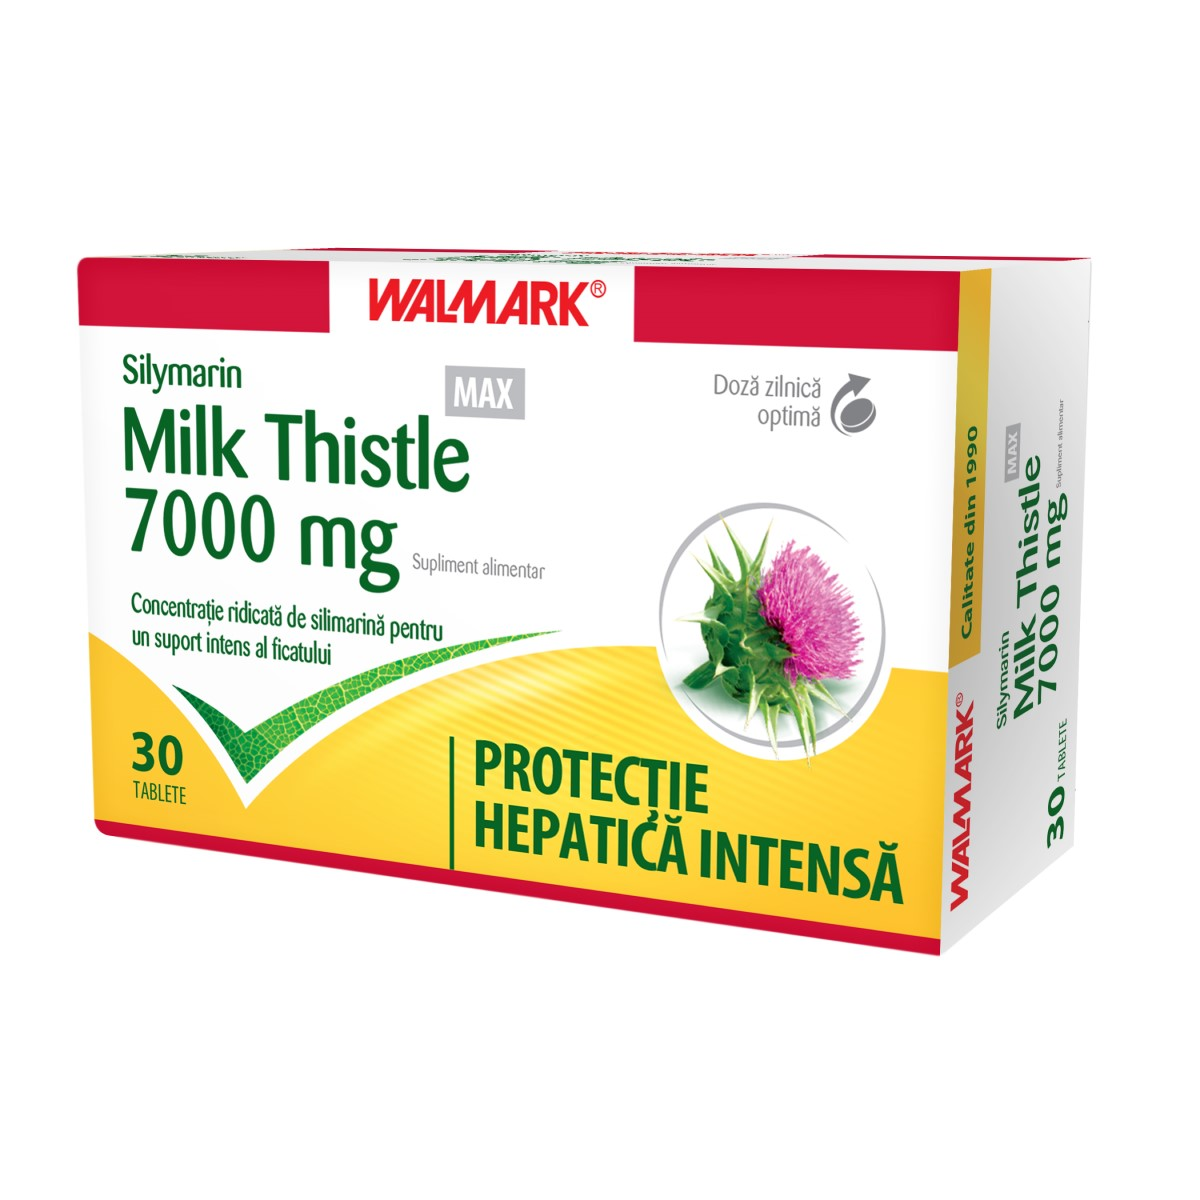 Silymarin Milk Thistle MAX, 30 comprimate filmate, Walmark imagine produs 2021